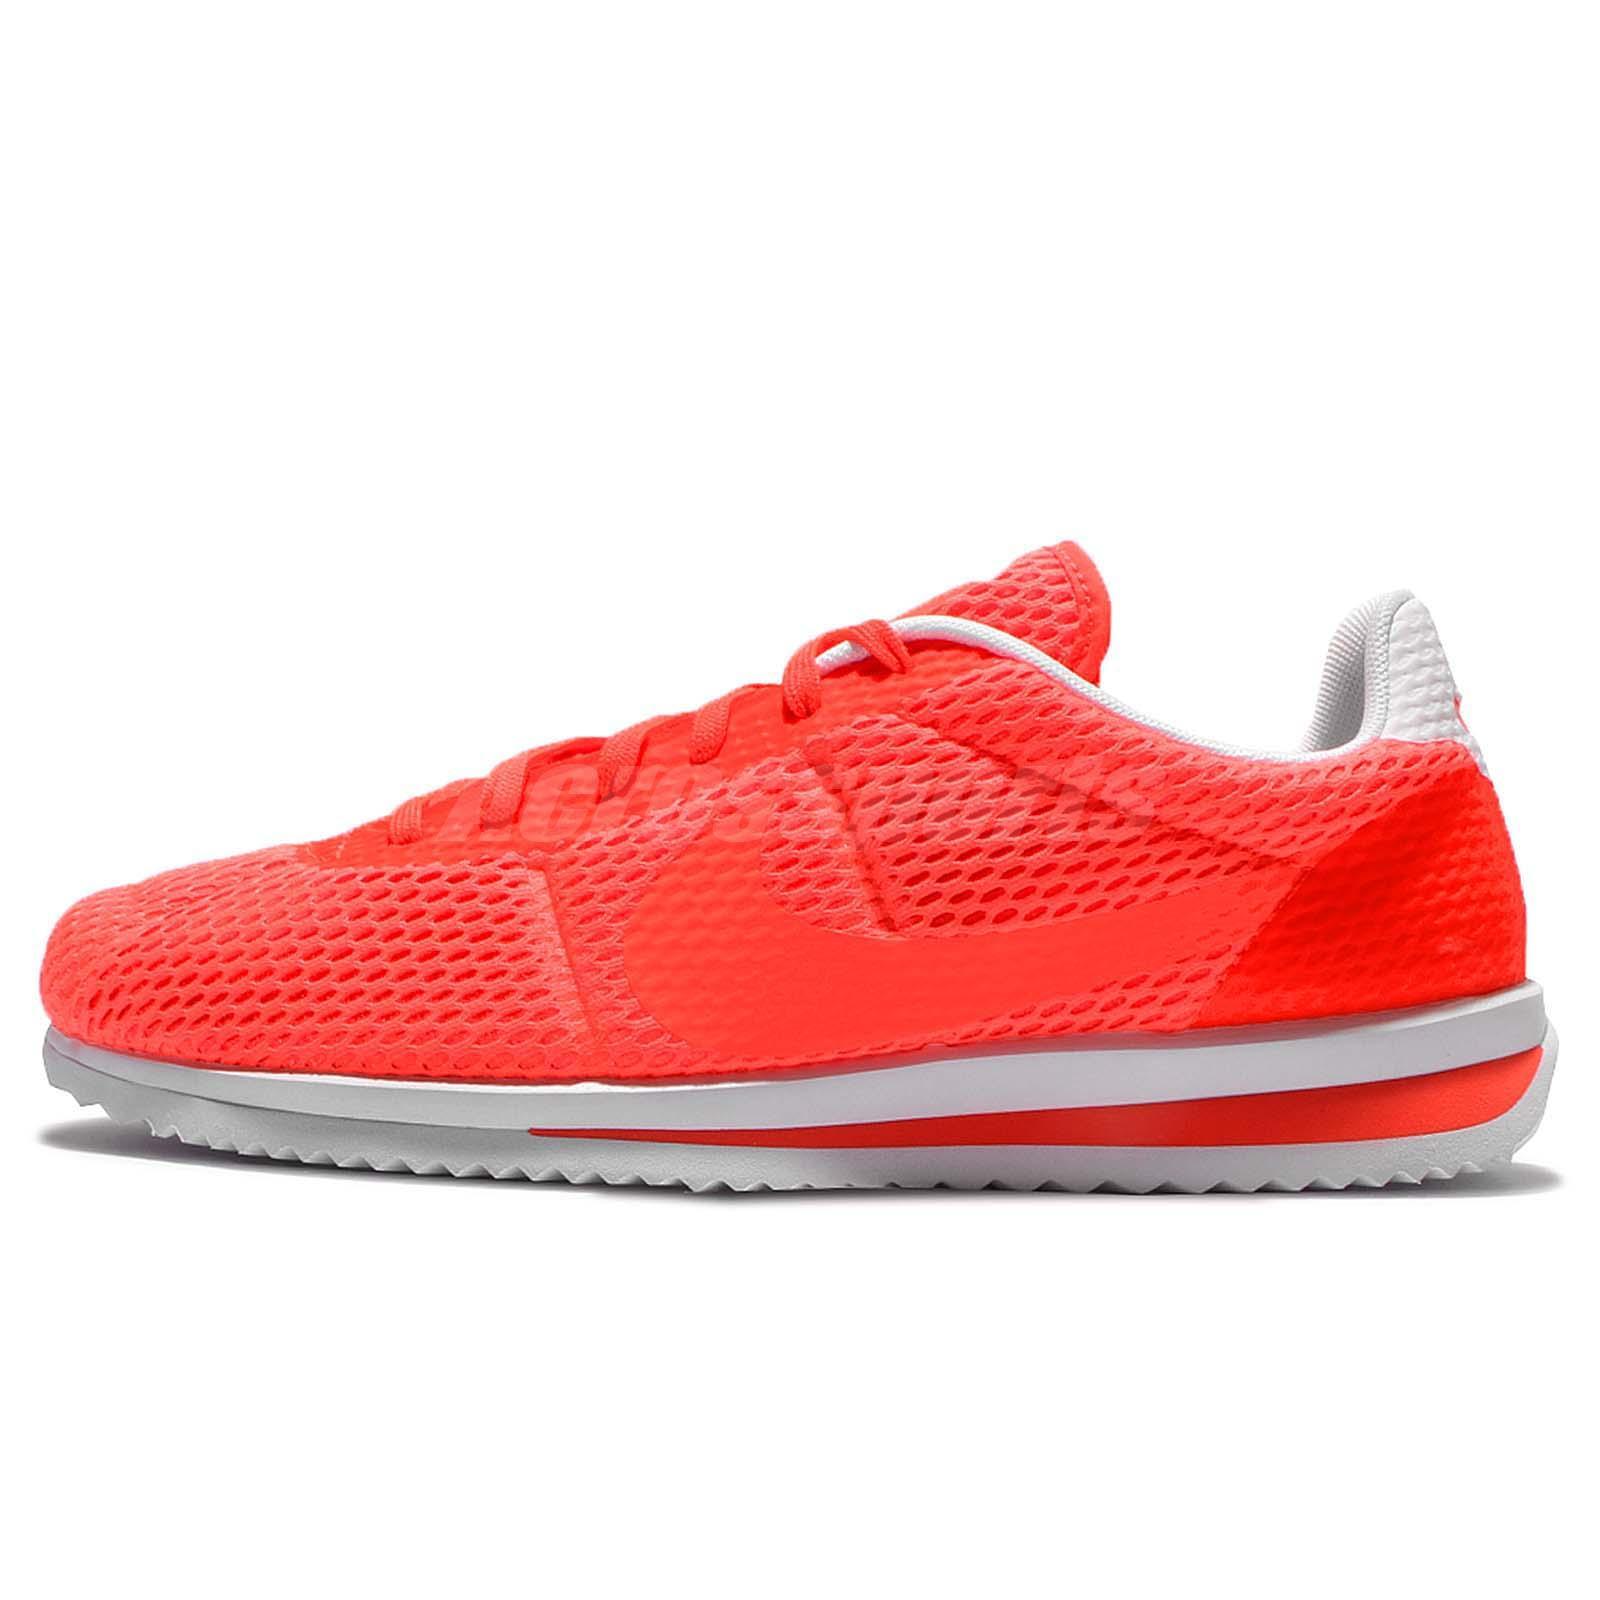 3c6aab2d5cb2 Nike Cortez Ultra BR Breathe Total Crimson Men Classic Shoes Sneakers  833128-800